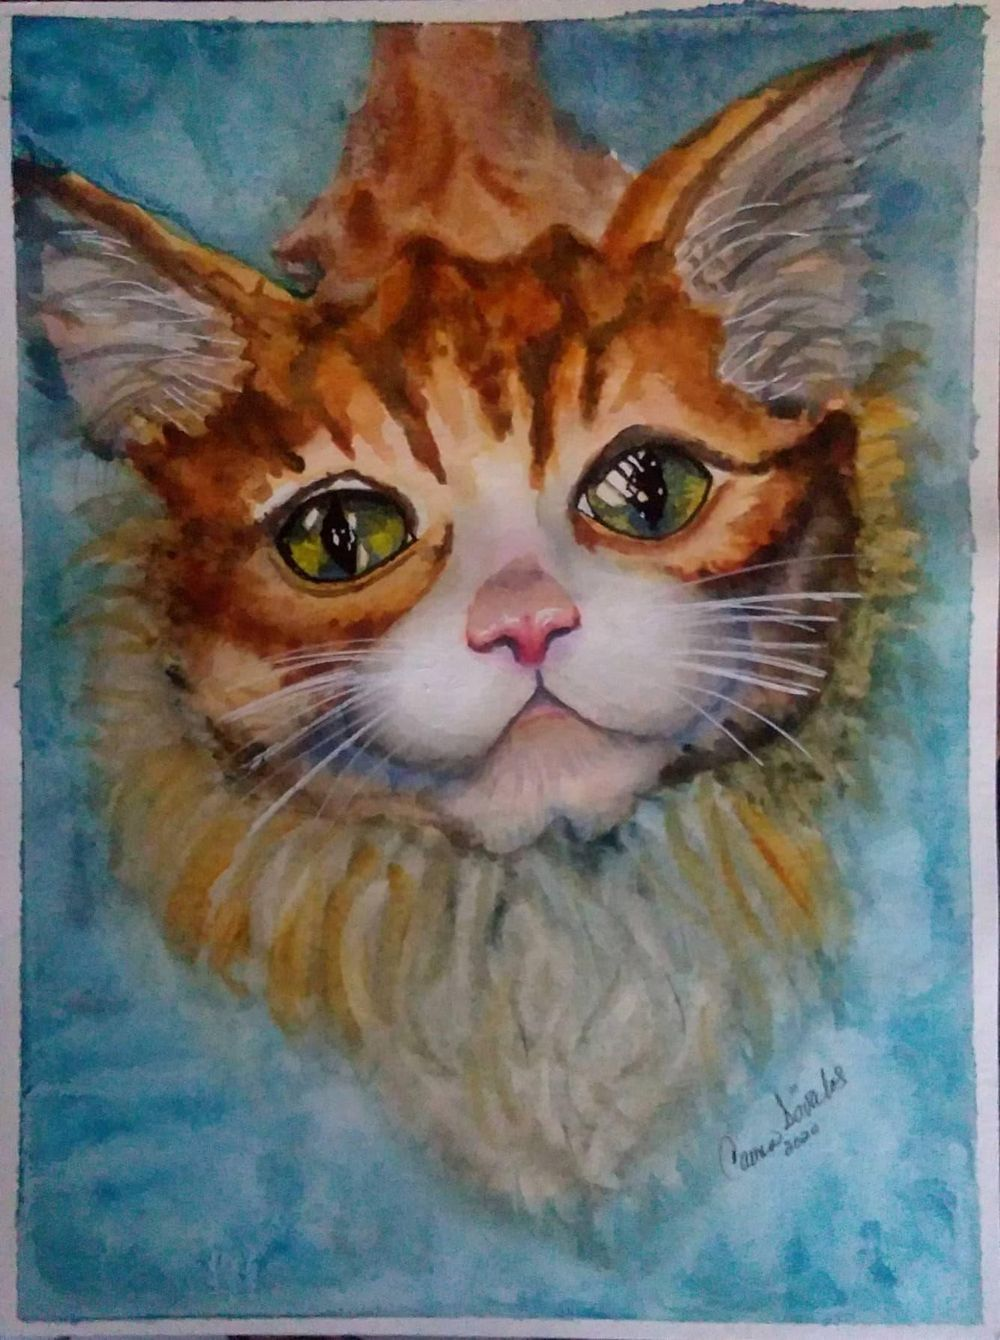 Cat. Carmen Davalos - image 1 - student project